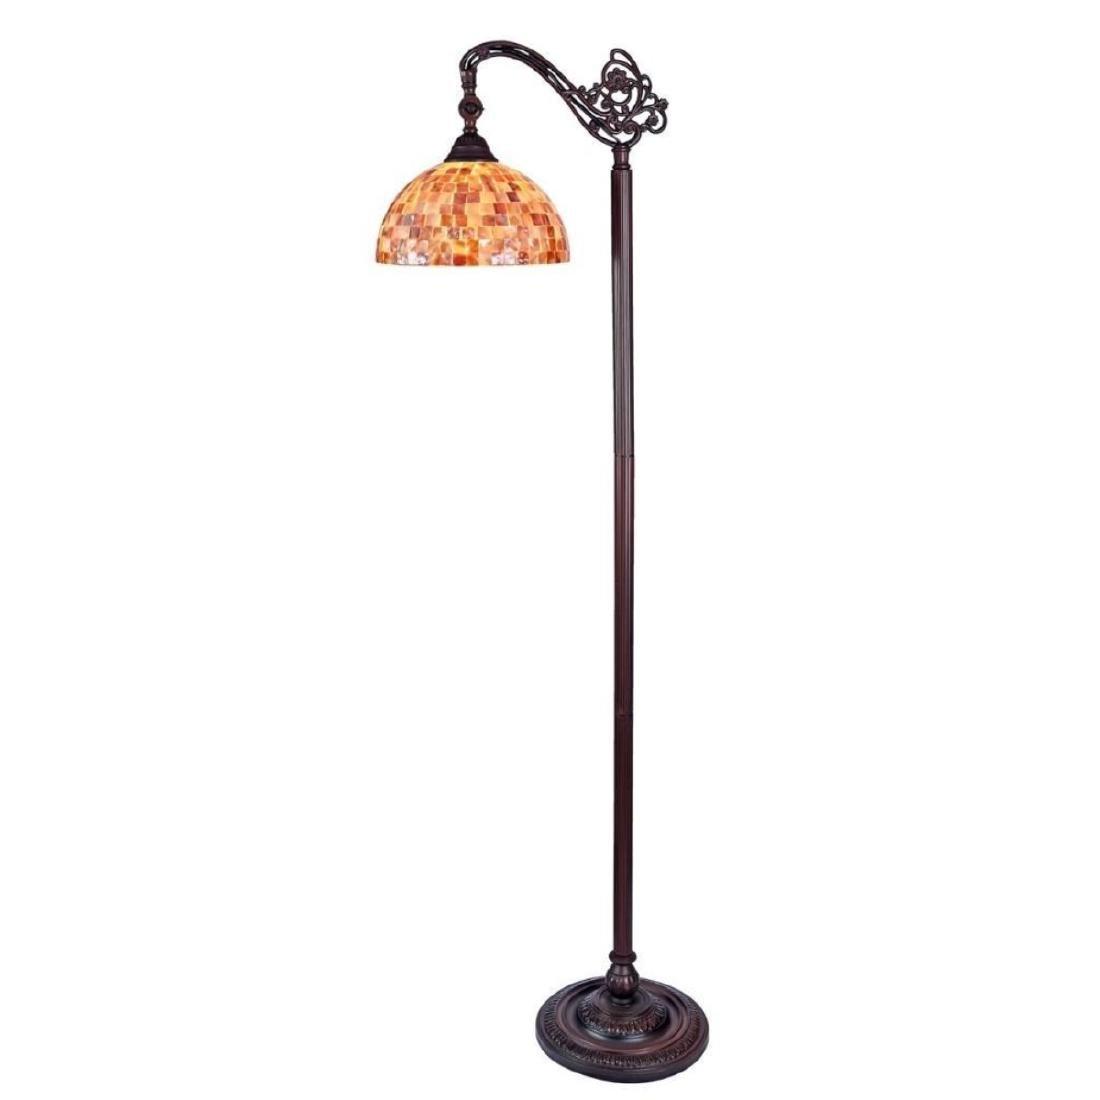 Tiffany-style Reading Floor Lamp - 2